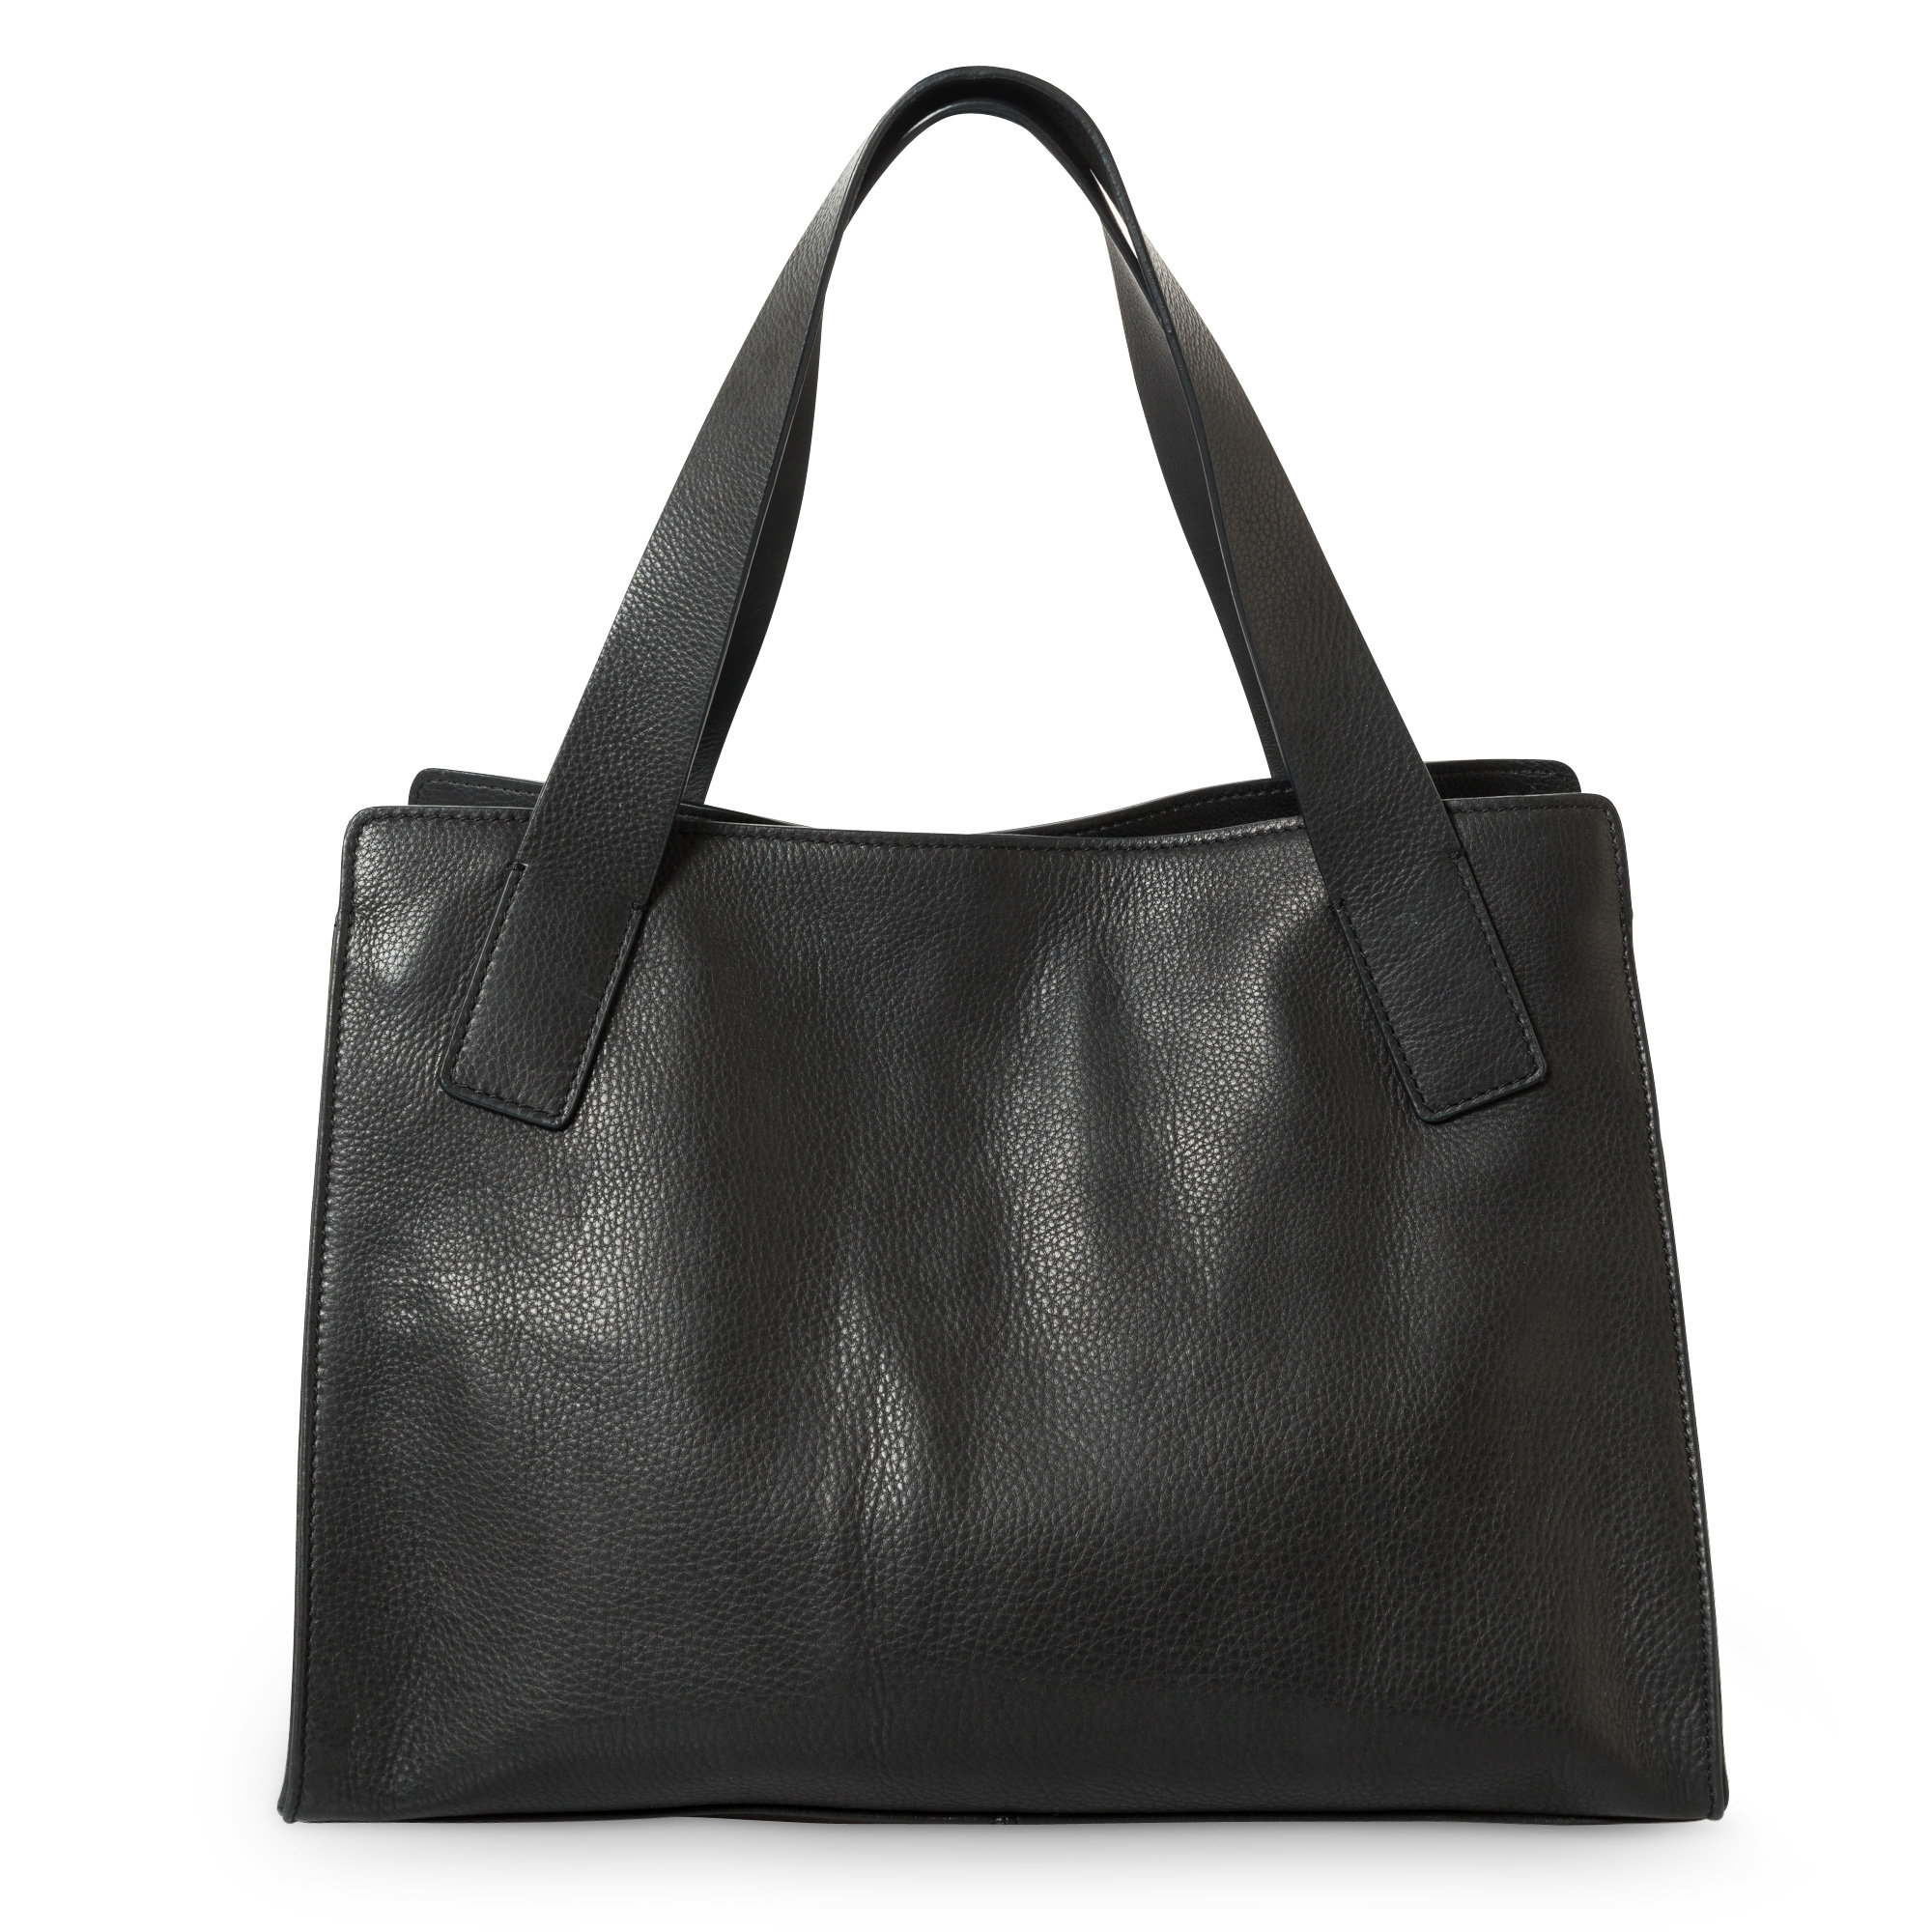 Silver leather tote bag uk - Esme Medium Leather Tote Bag